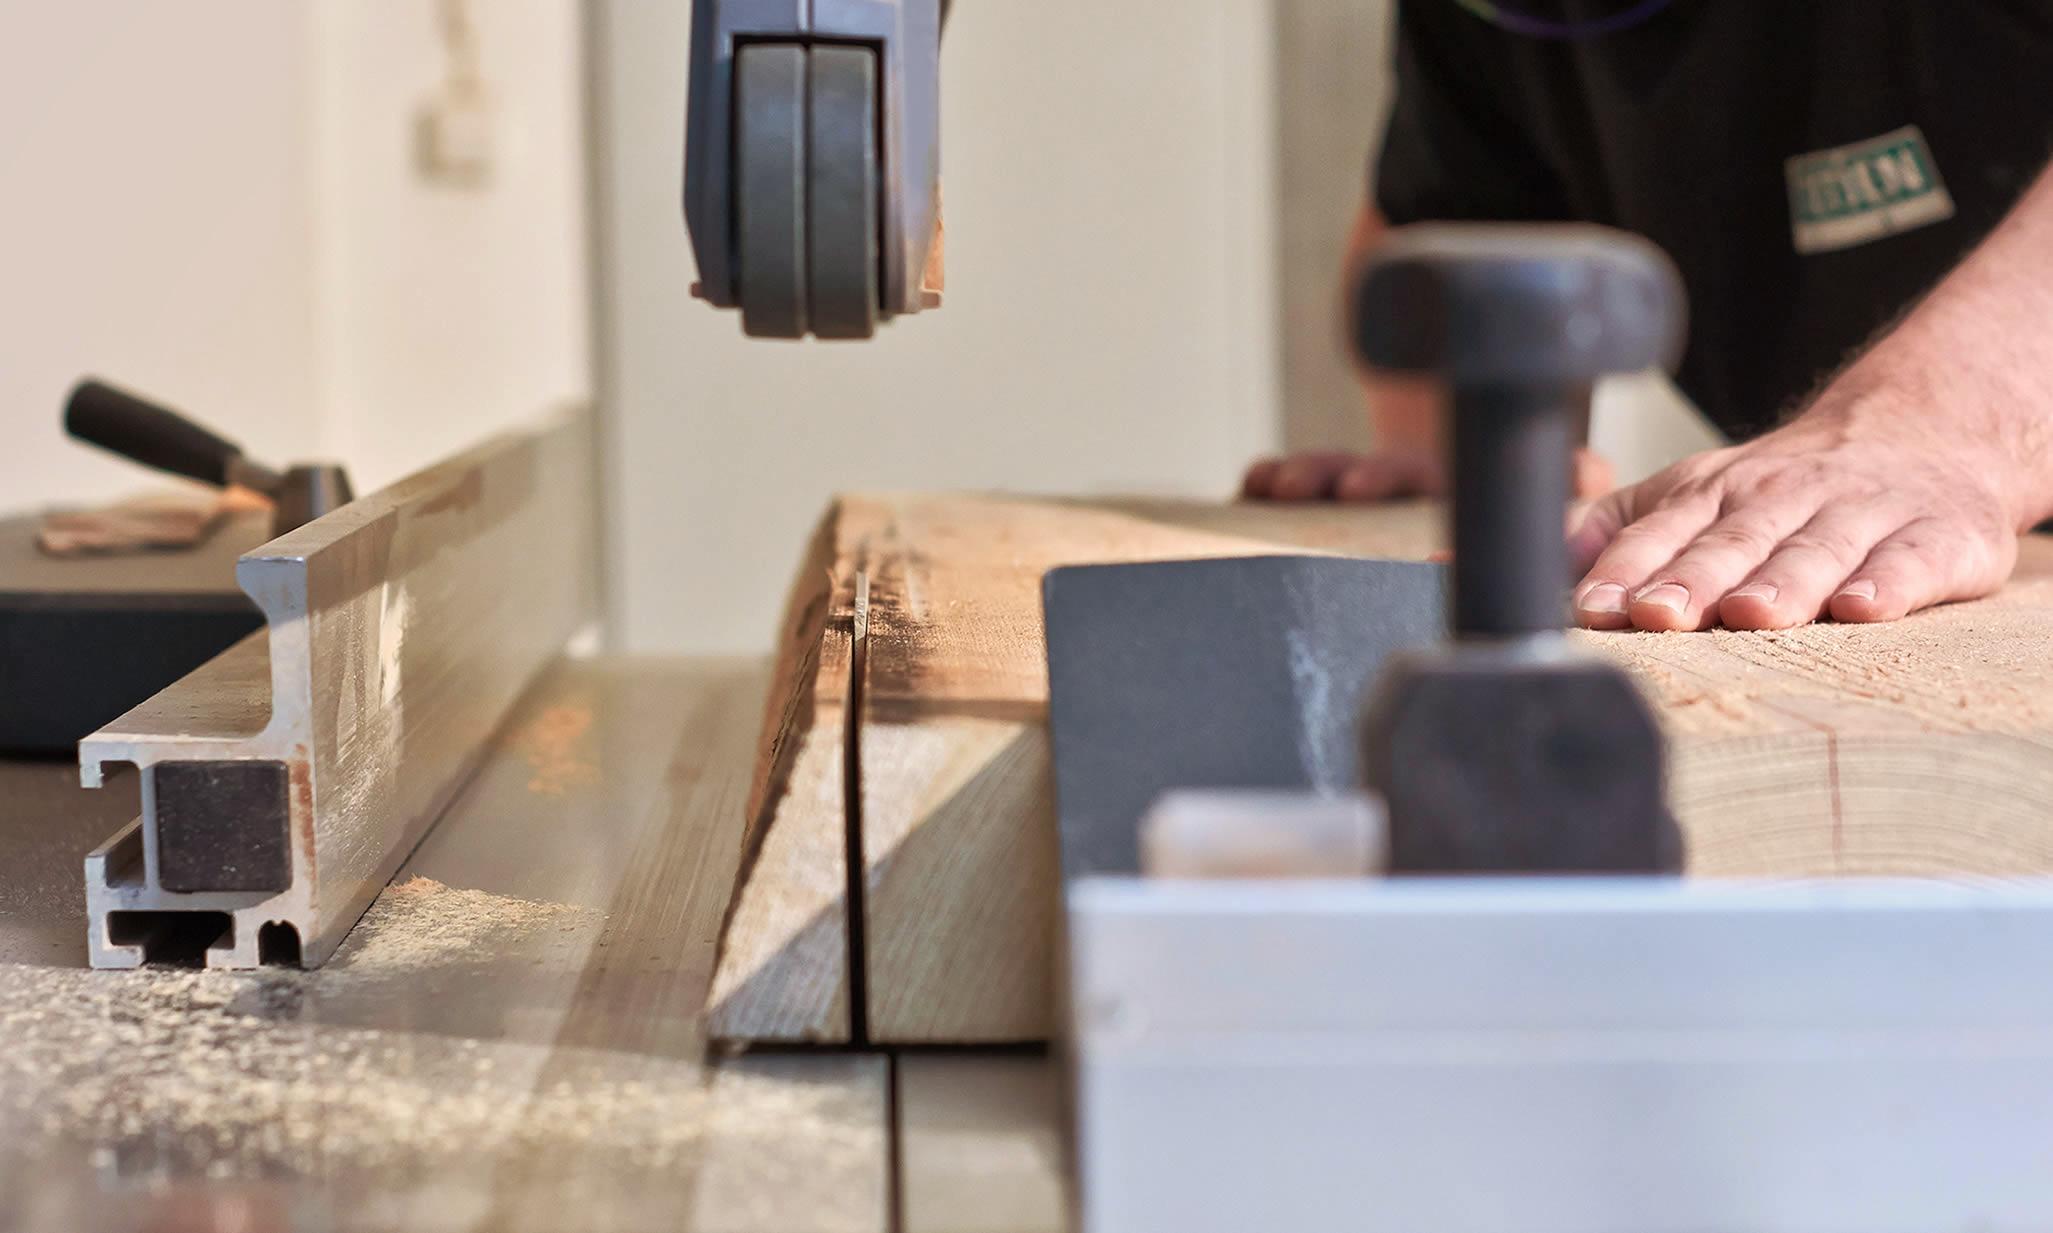 Tietjen Holz Kunststoff Technik Handwerksqualit T Vom